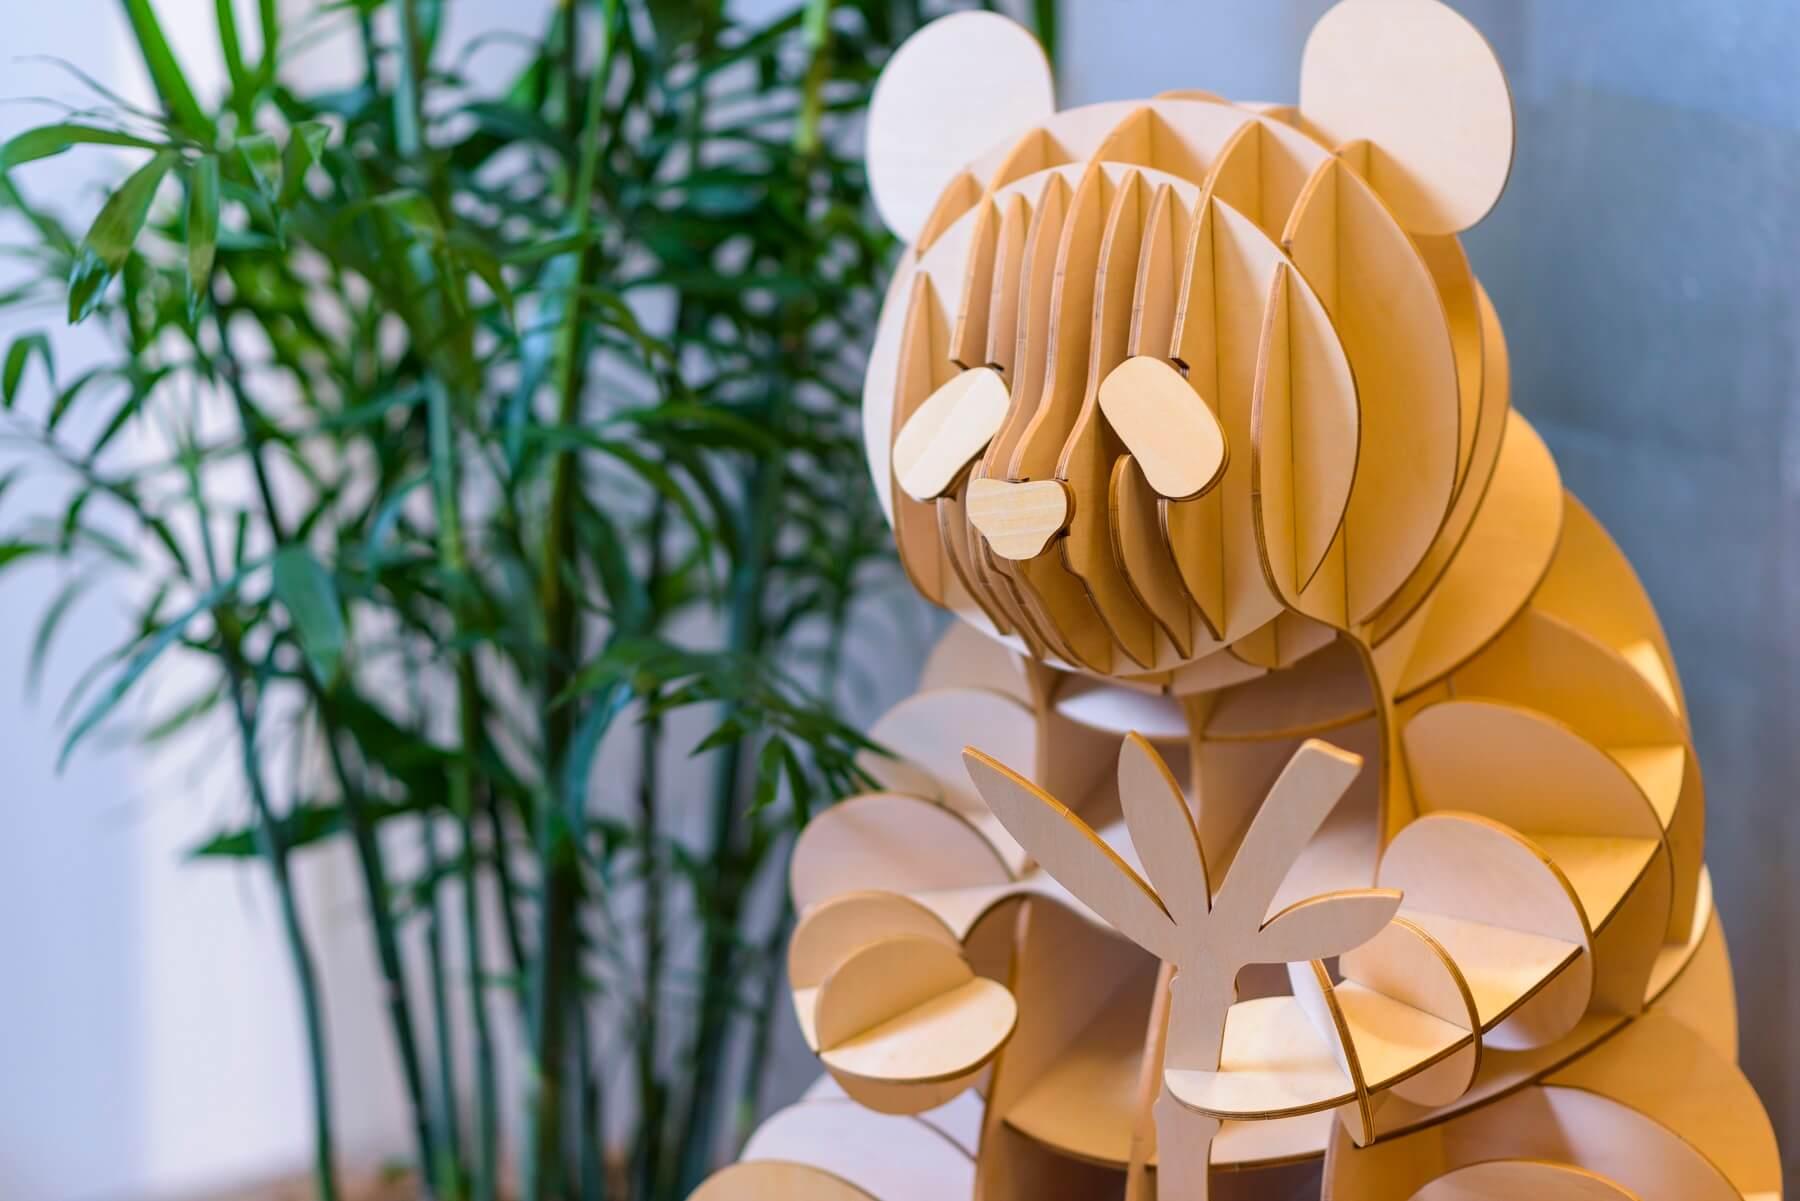 ki-gu-miパンダがロビーでお出迎え♡